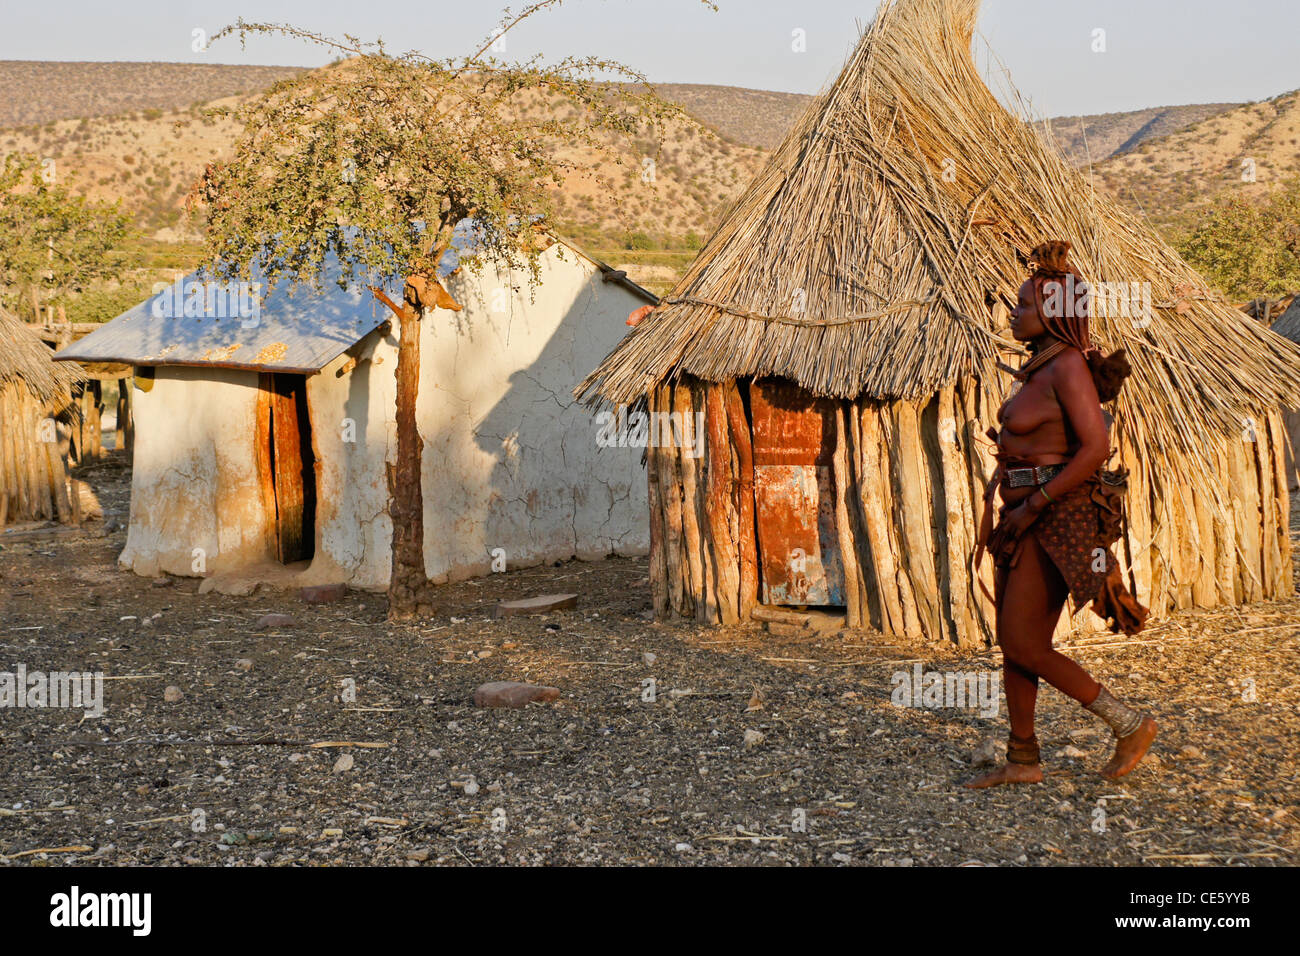 Himba woman in village near Opuwo, Namibia - Stock Image